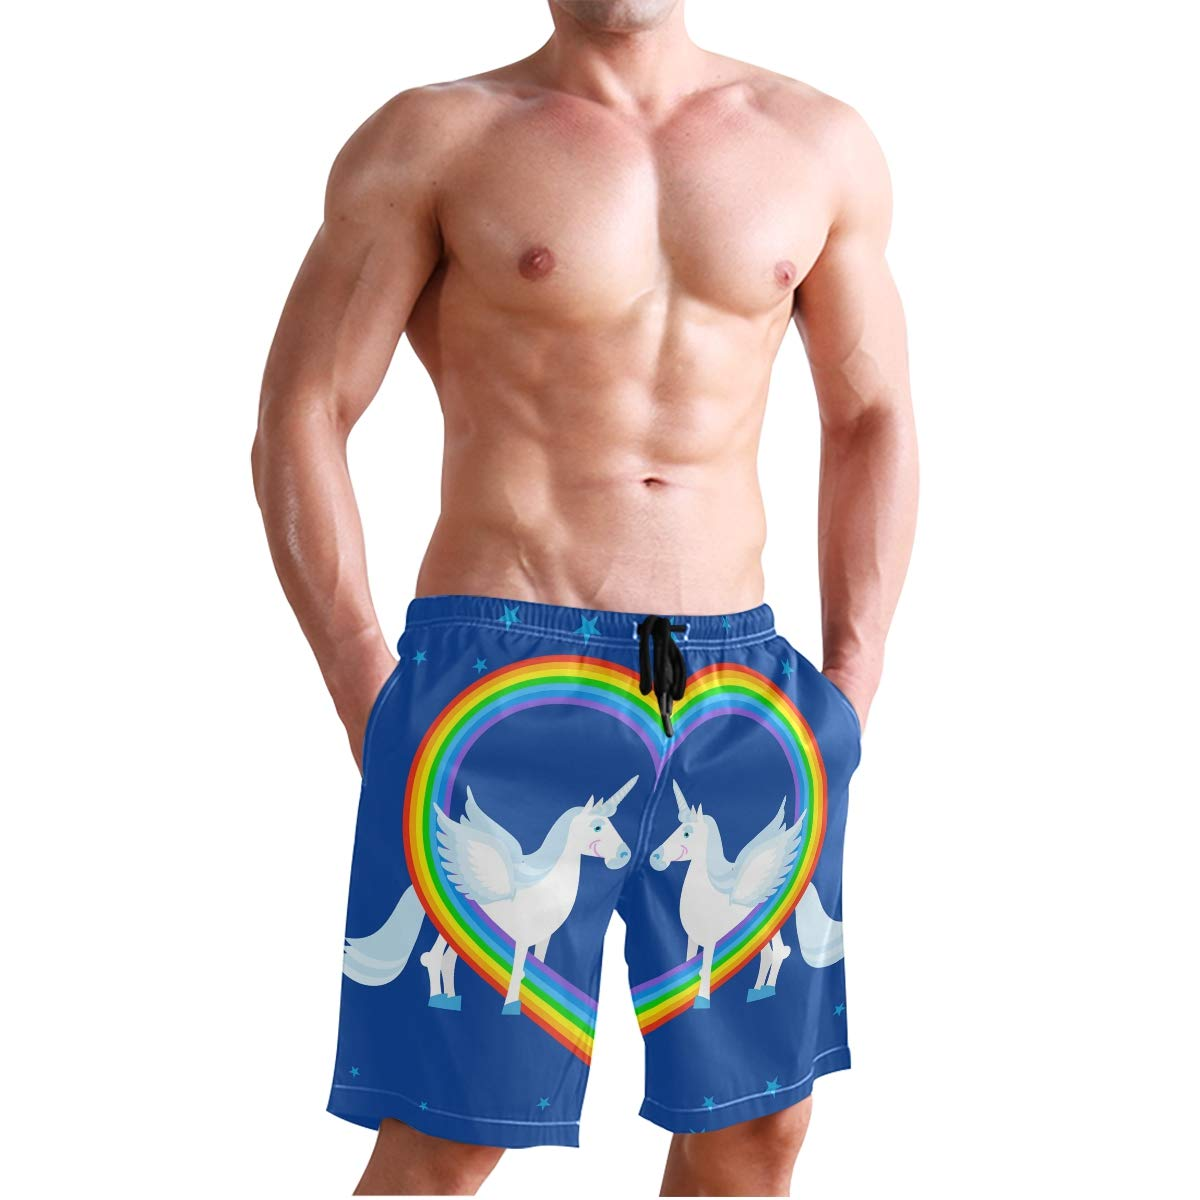 Mens Beach Swim Trunks Two Blue Unicorn Rainbow Heart Boxer Swimsuit Underwear Board Shorts with Pocket